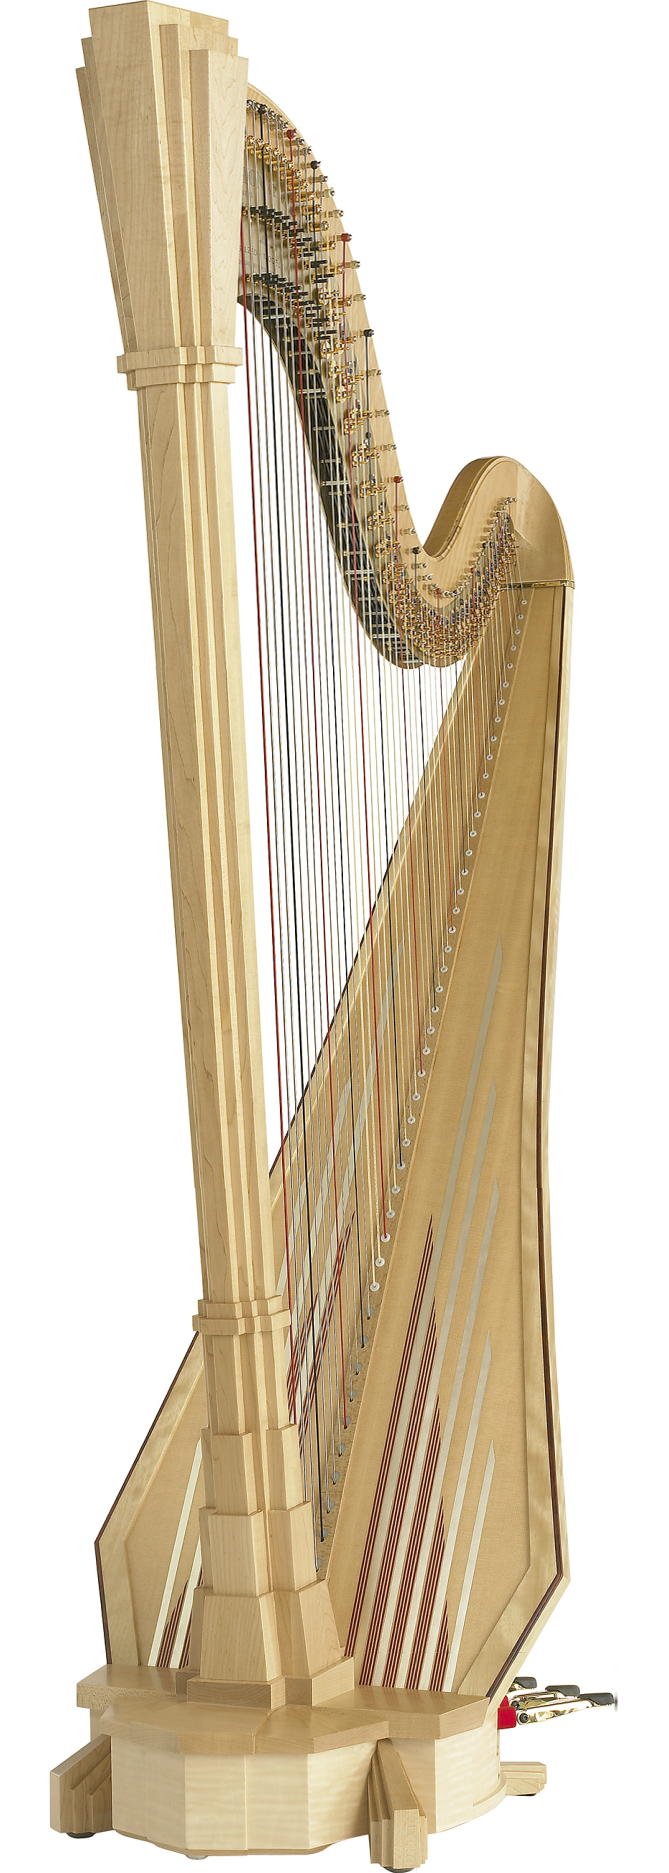 Lyon & Healy SALZEDO - Pedálová harfa